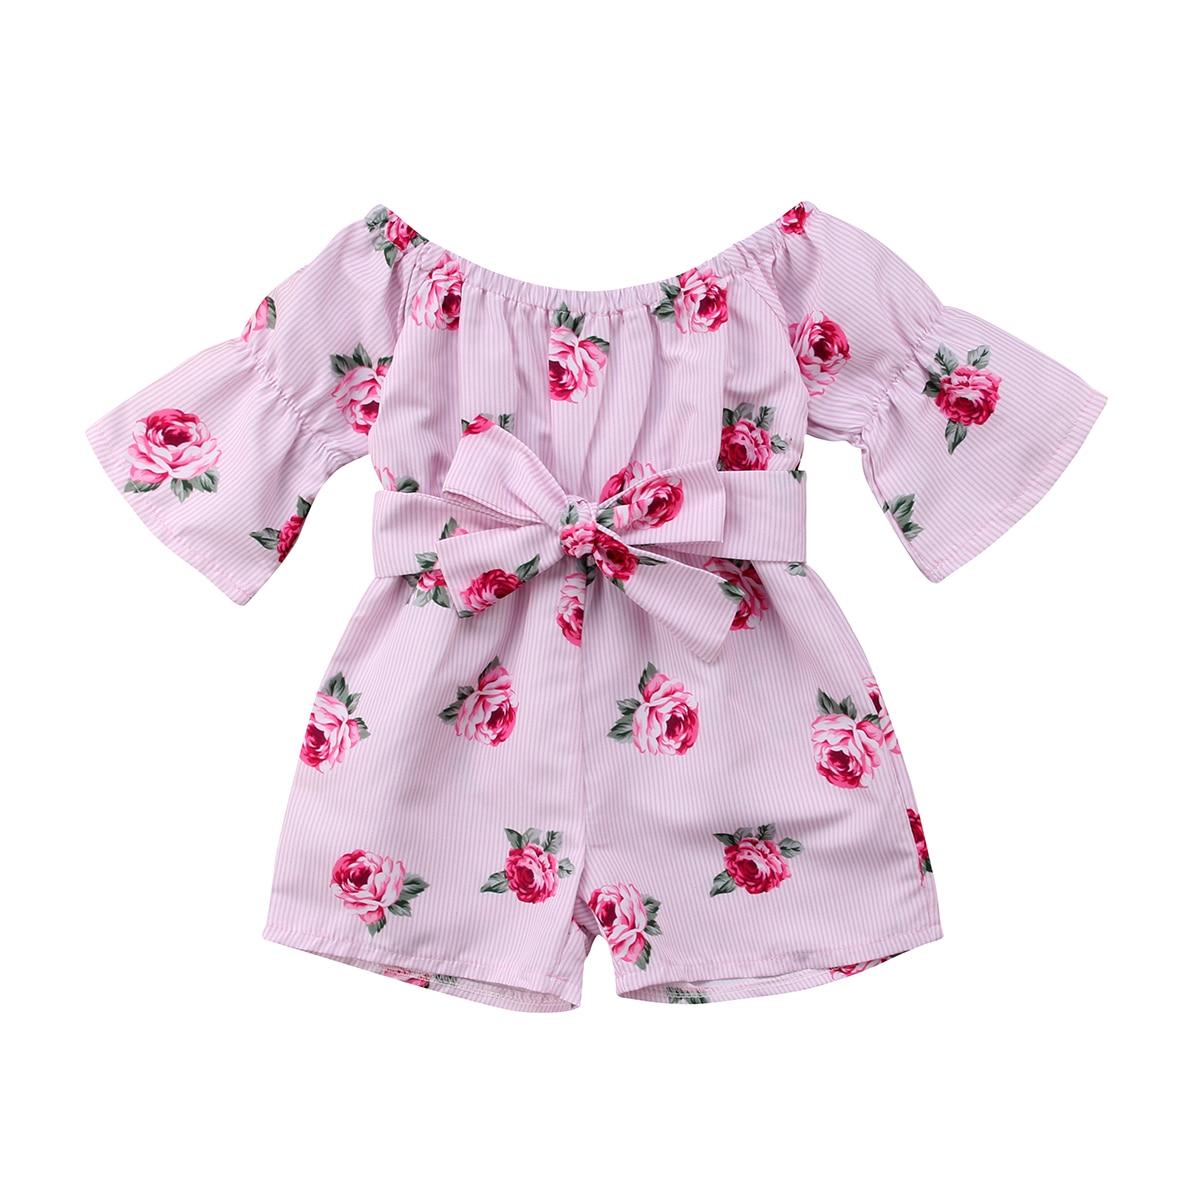 839514546030 aliexpress.com - 2018 New Baby Boy Rompers Kids Short Sleeve ...